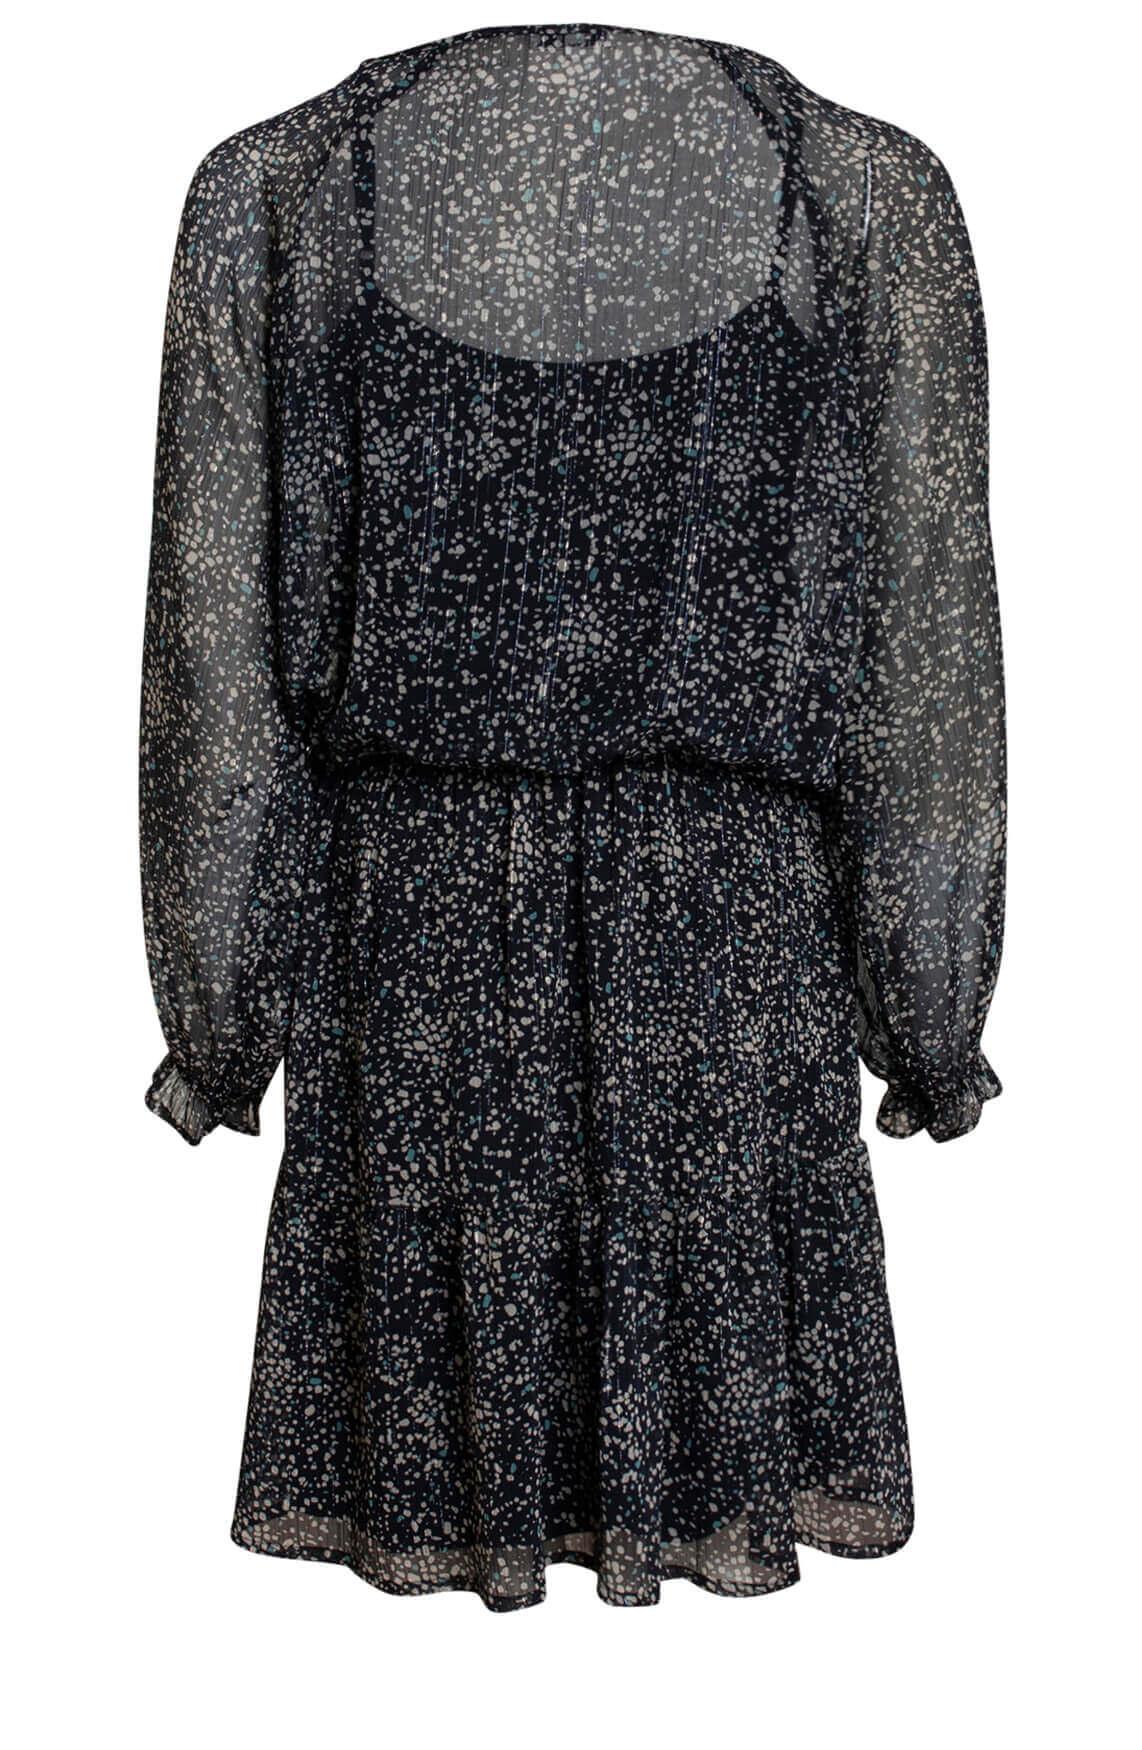 Anna Dames Chiffon jurk zwart